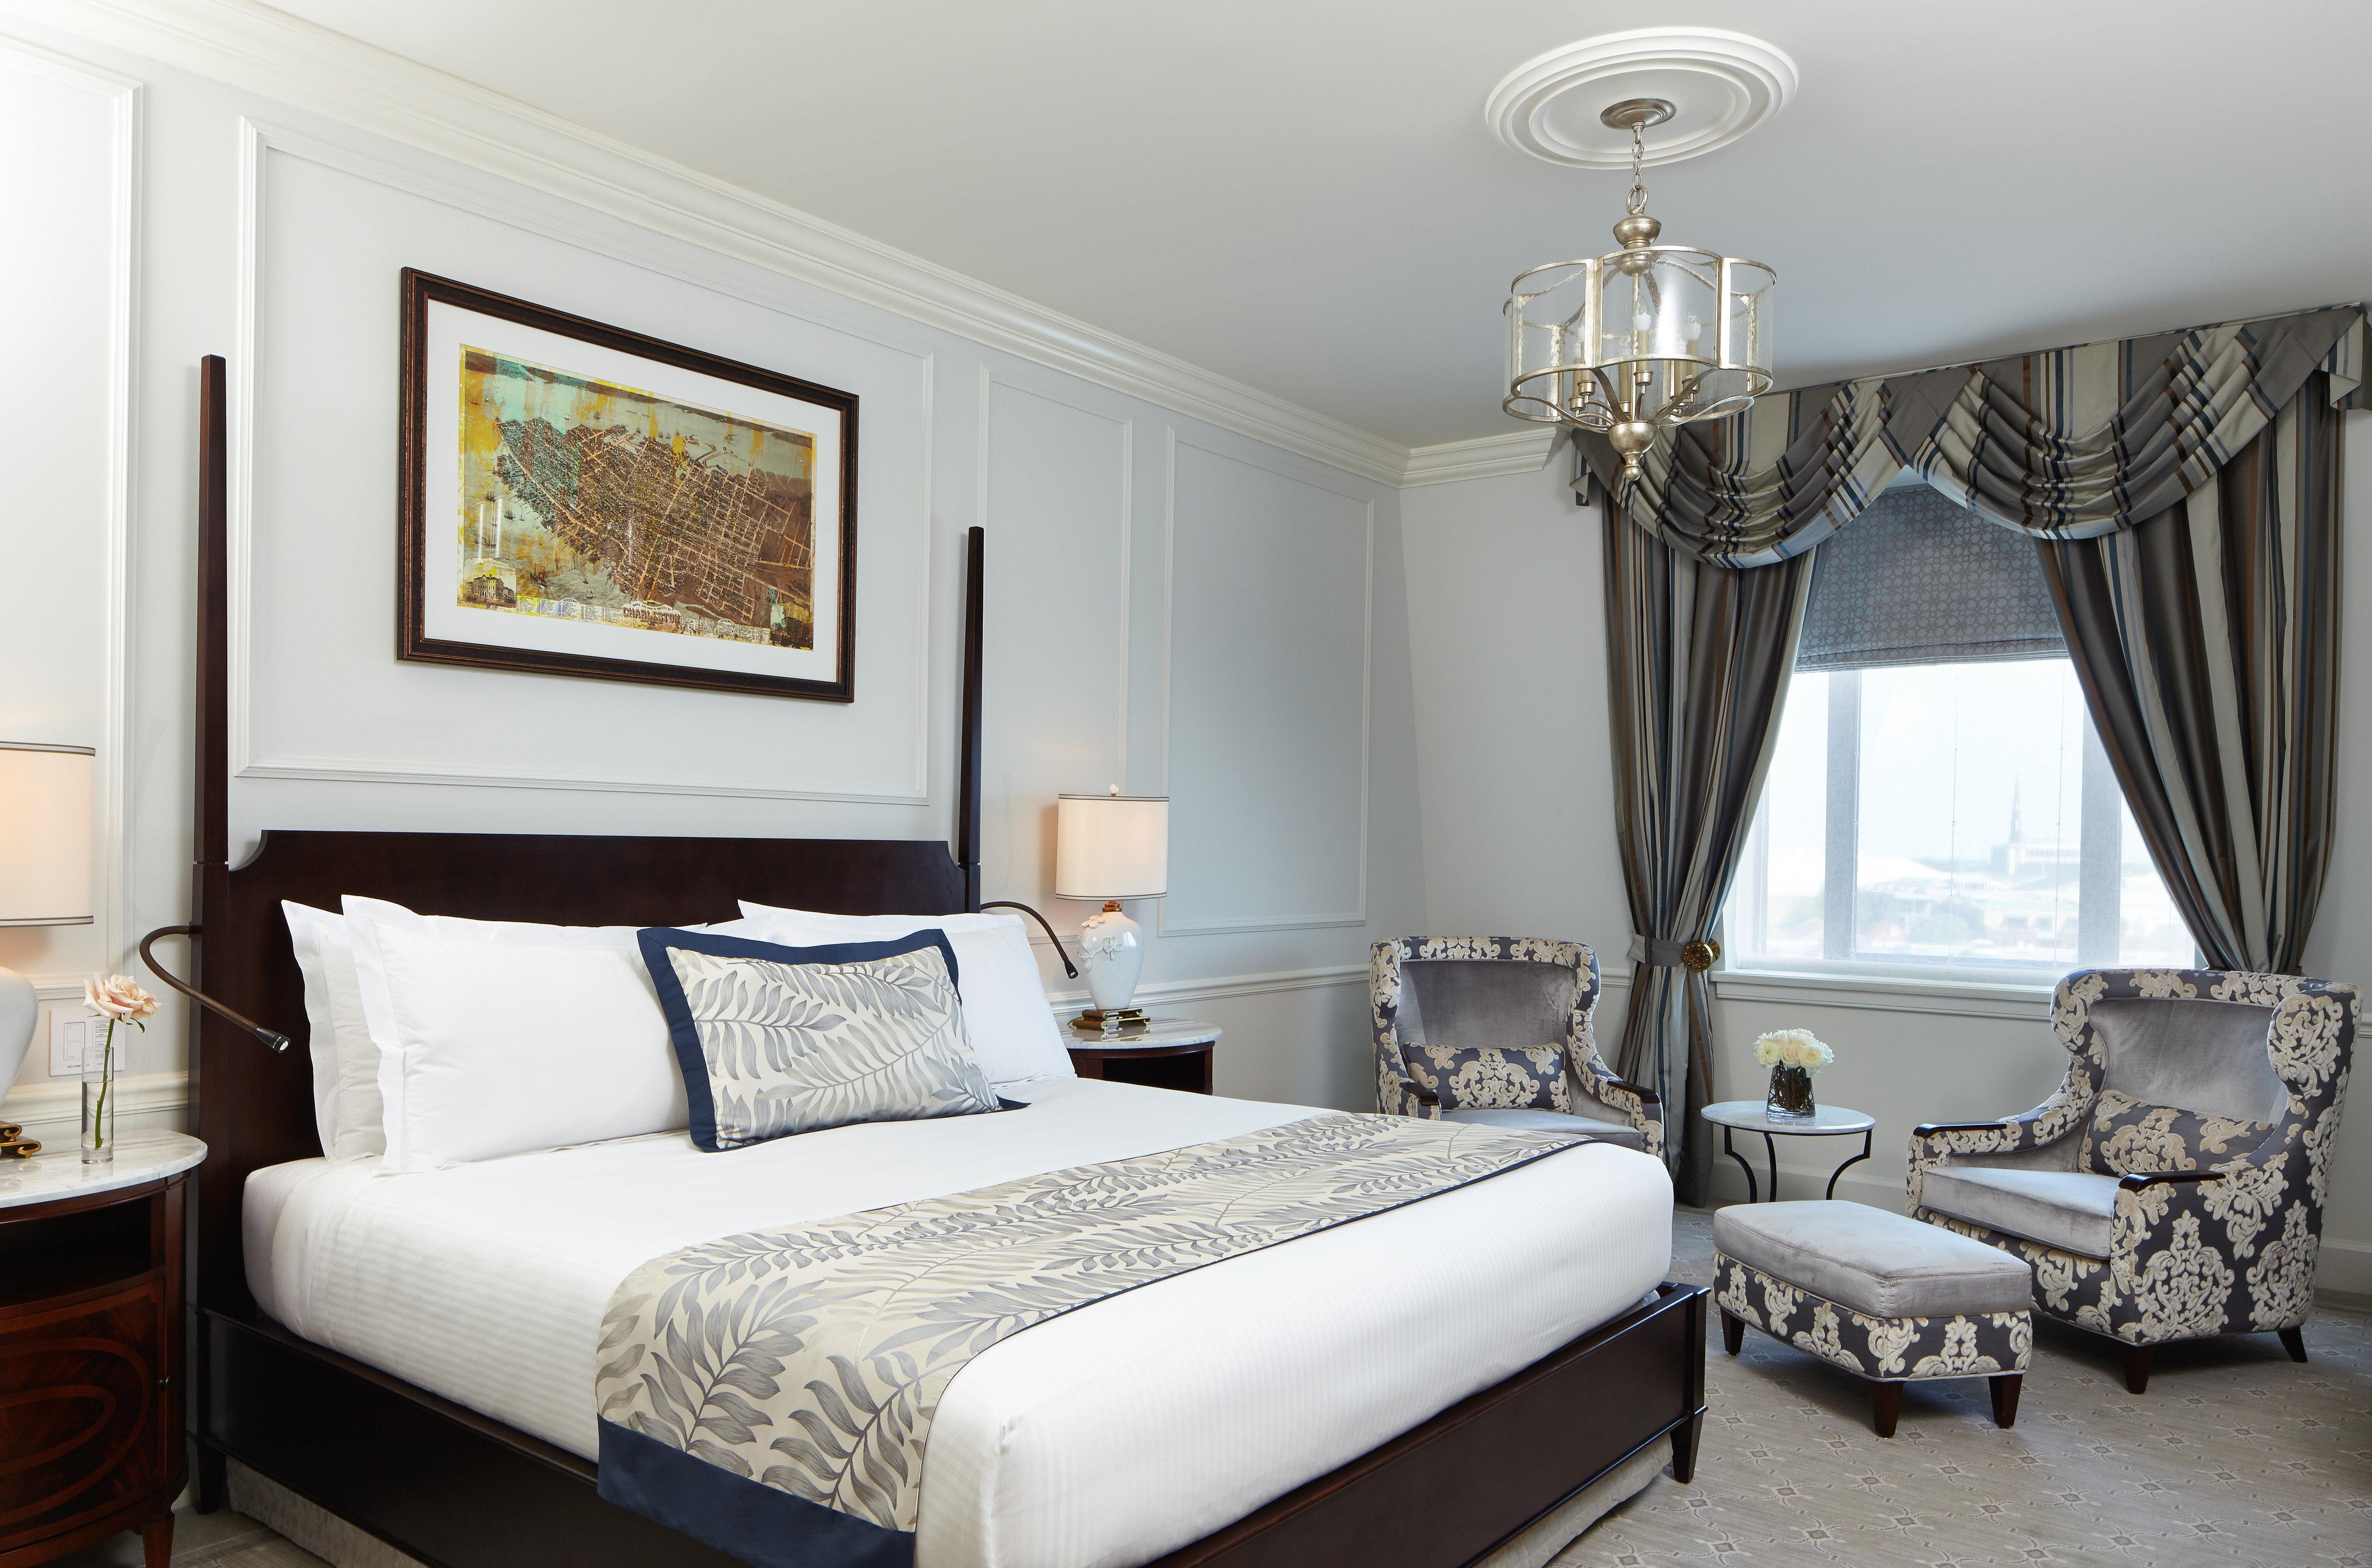 Bedroom City Classic Elegant Historic Hotels Romance Scenic views property living room Suite home cottage condominium